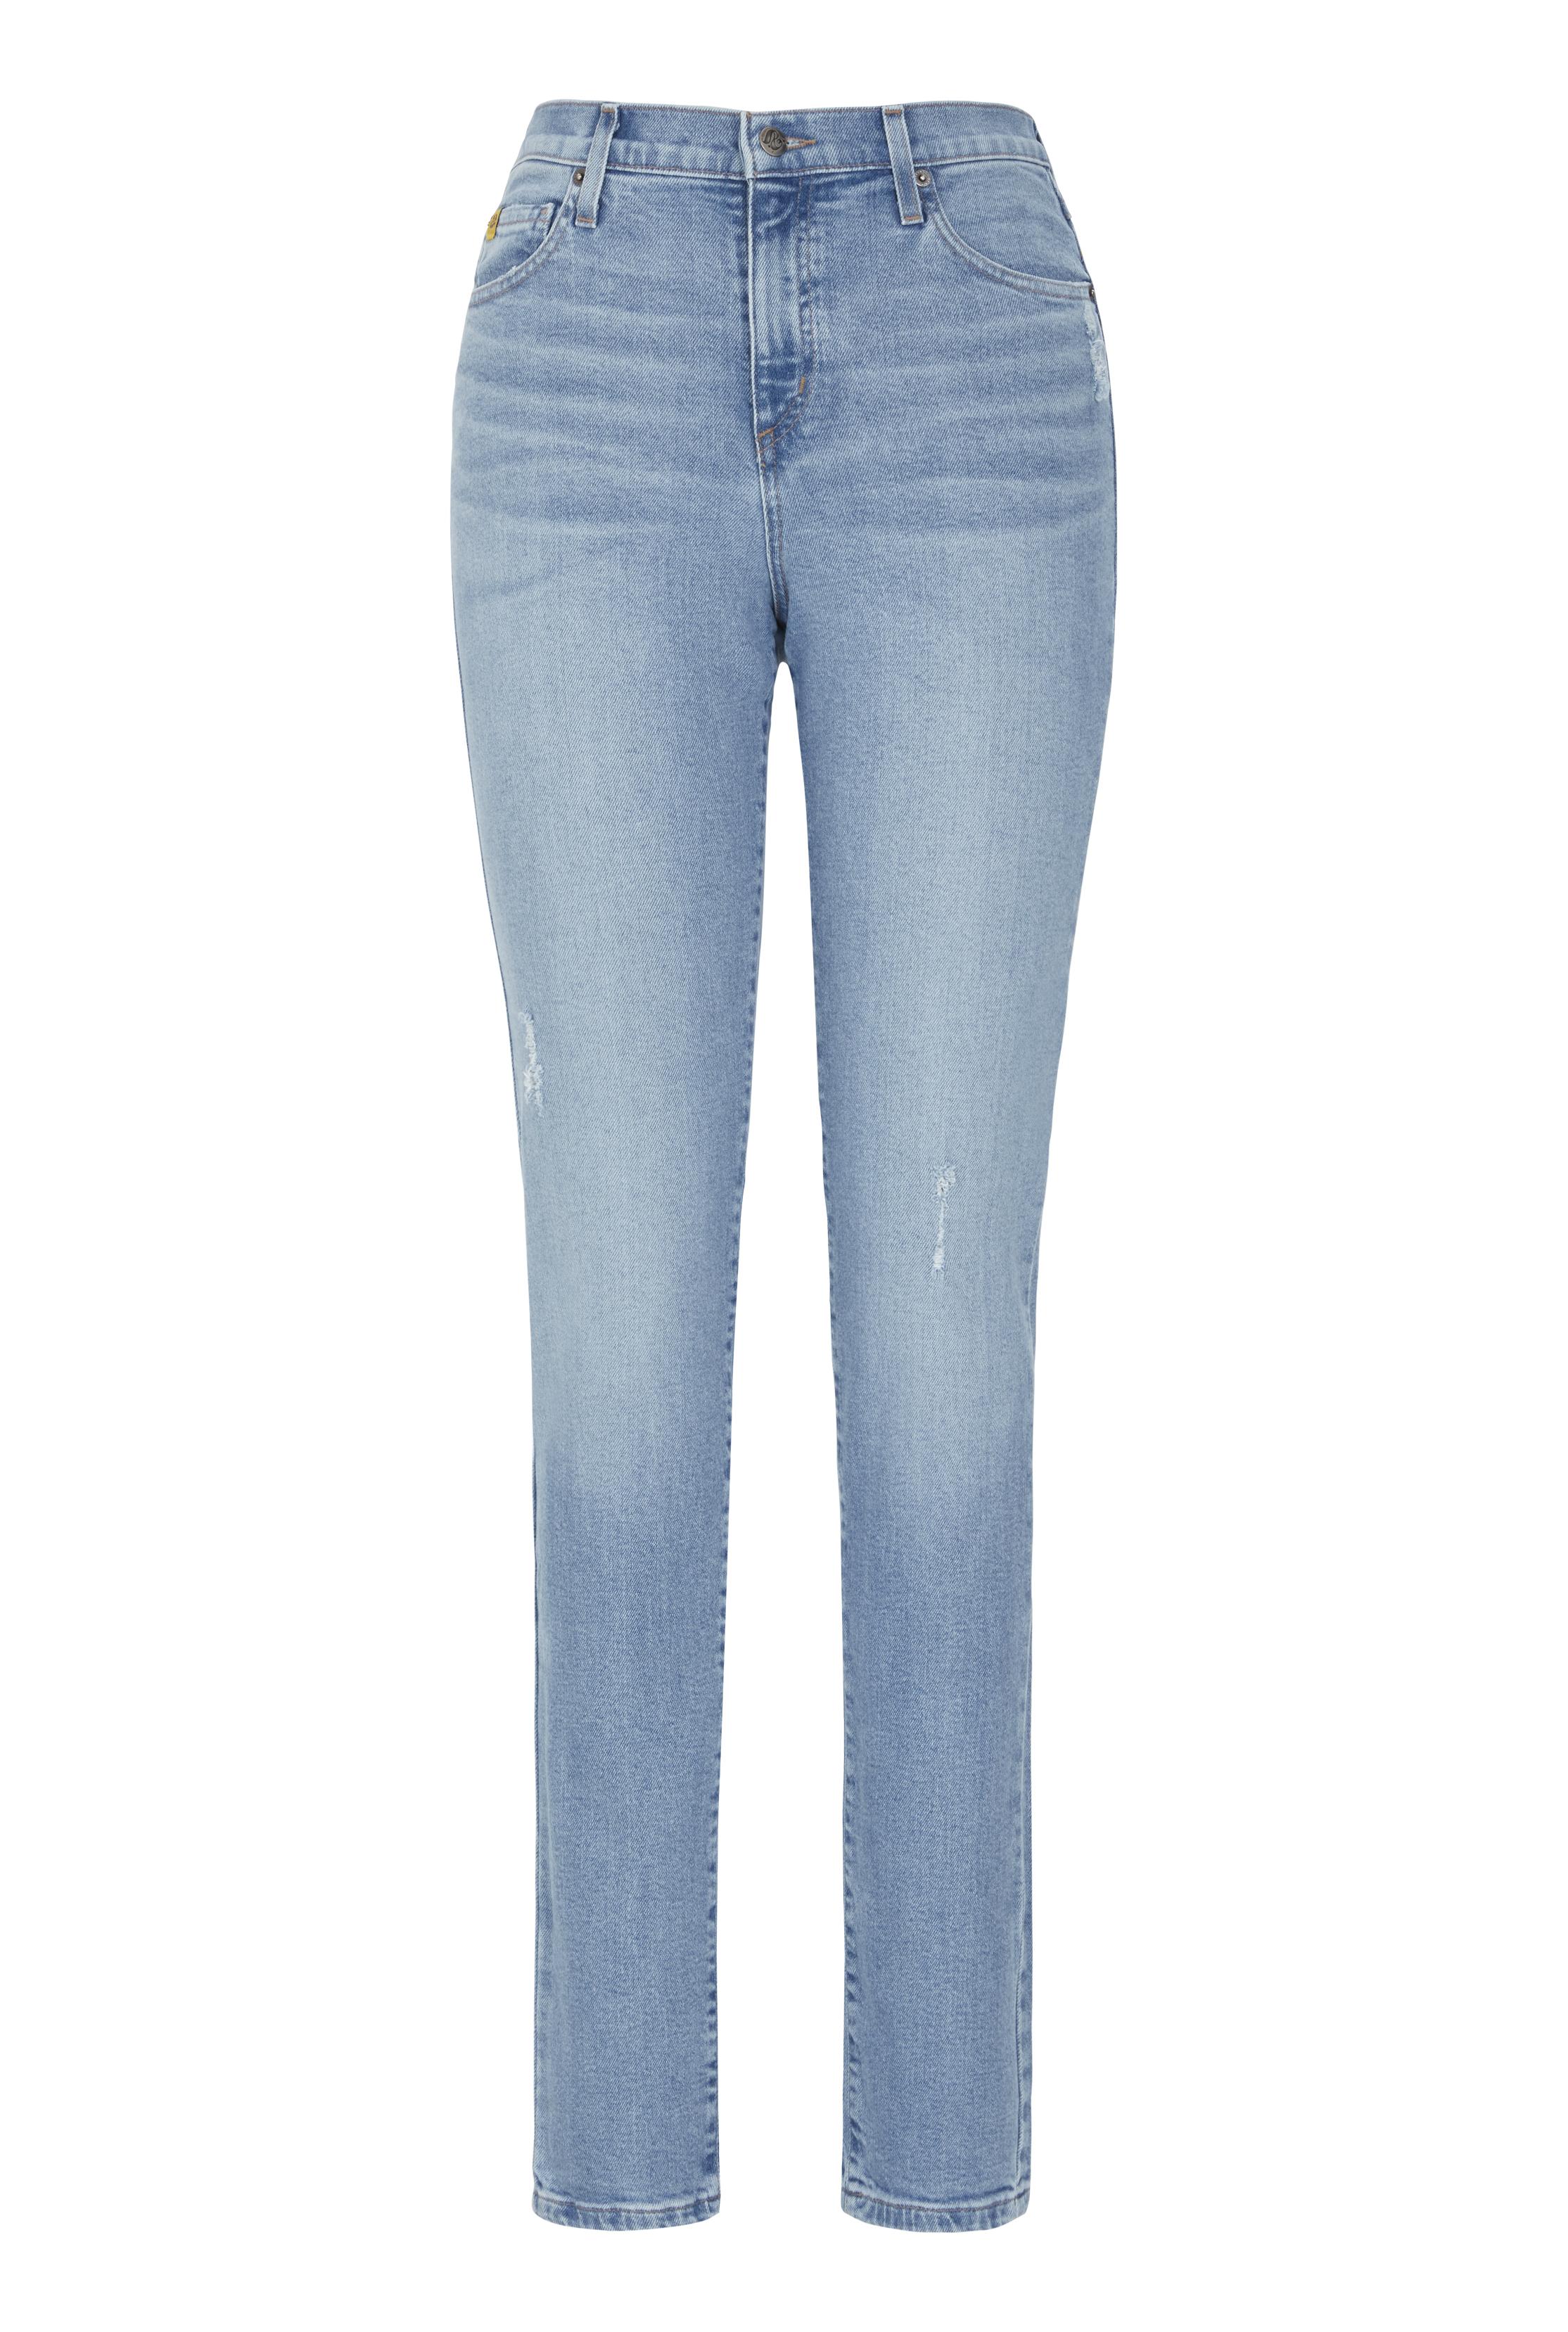 YOGA Blue Wash Slim Jean